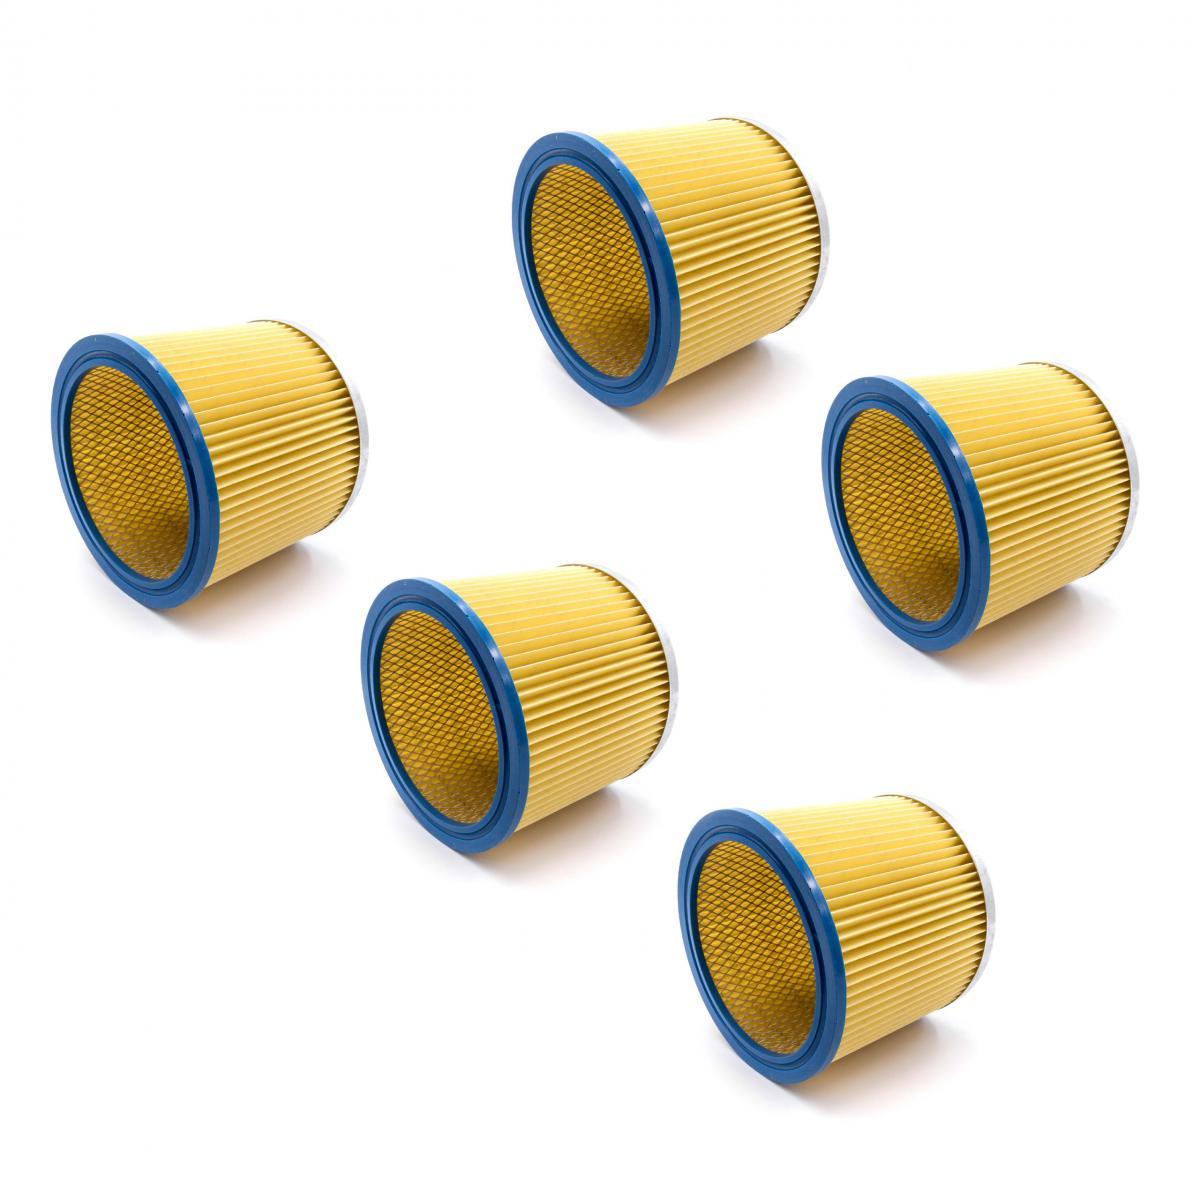 Vhbw vhbw 5x Filtre rond / filtre en lamelles pour aspirateur Shop-Vac Super 615 S2, Super 760, Ultra 40 Blower